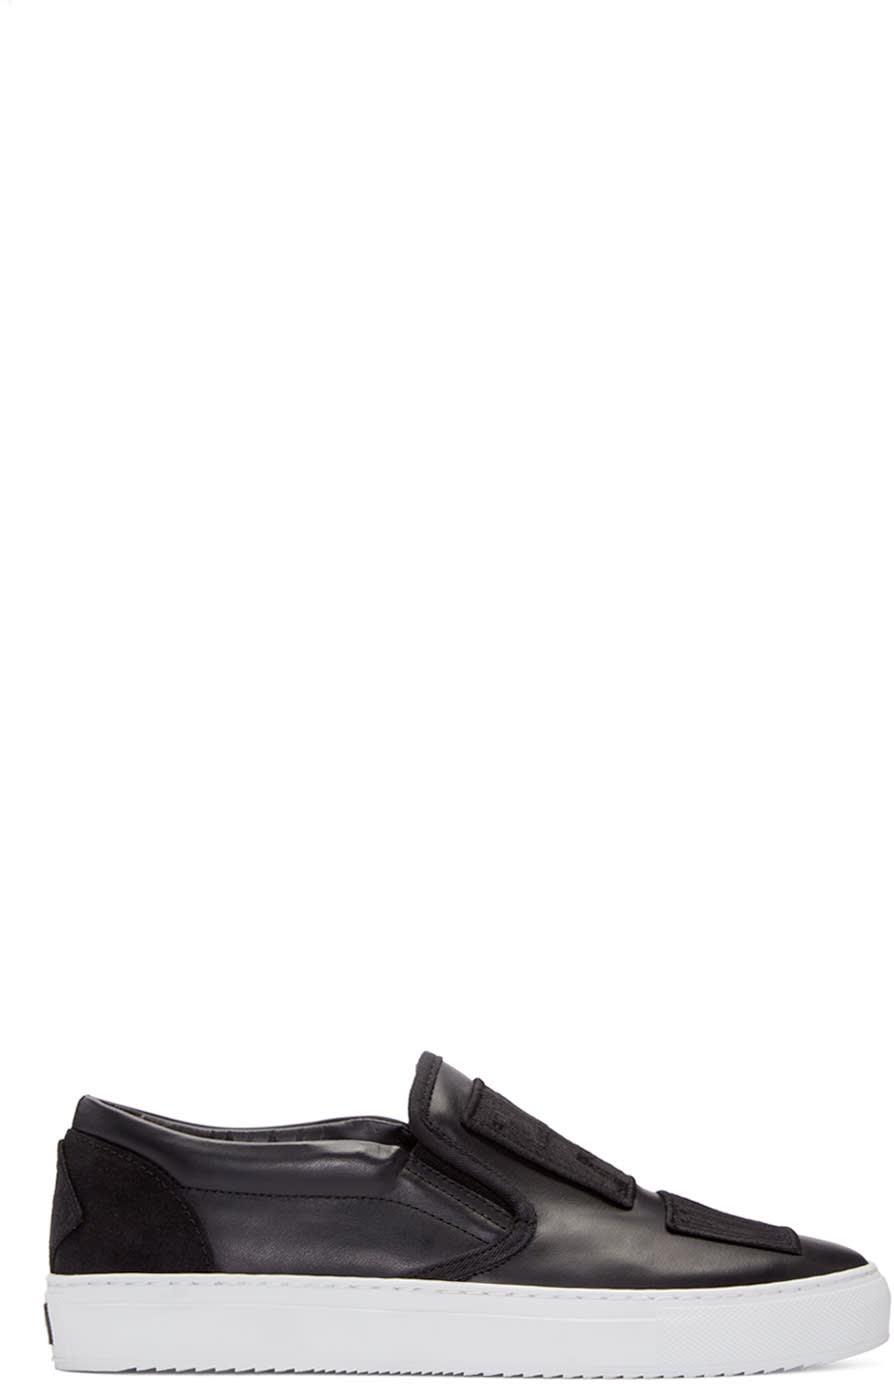 Marcelo Burlon County Of Milan Black Patch Slip-on Sneakers